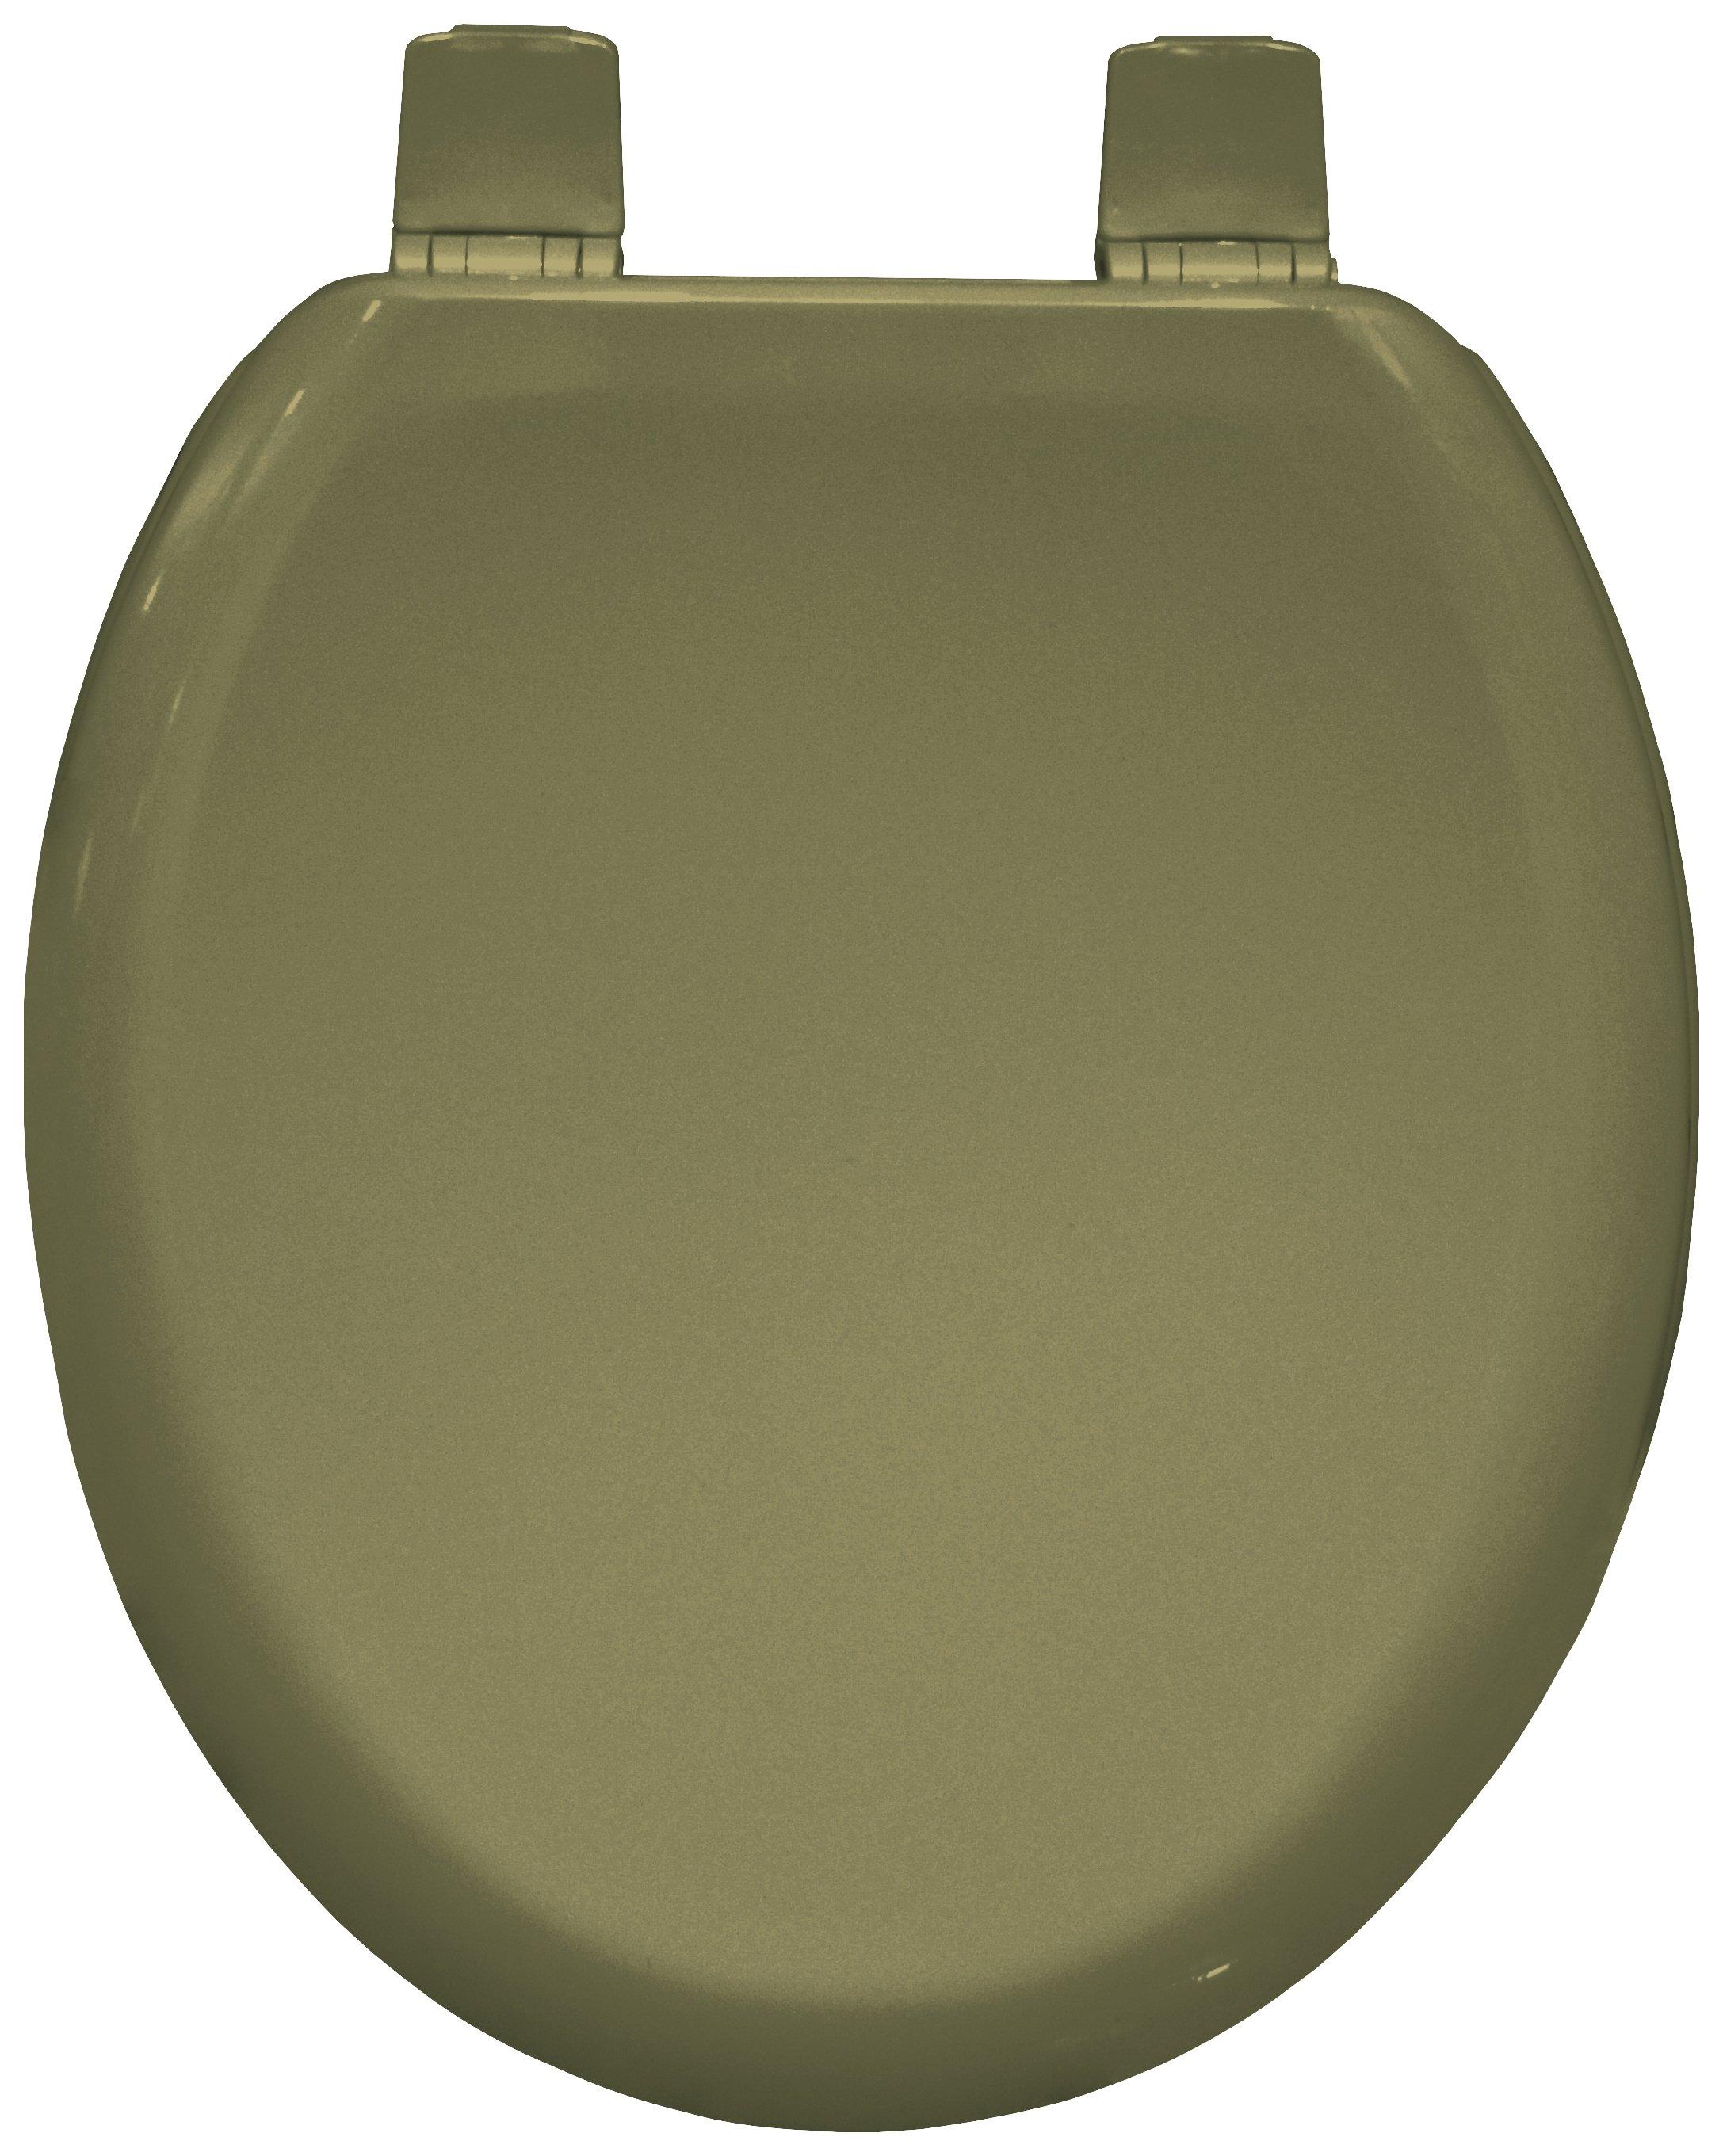 Prime Buy Bemis Chicago Moulded Wood Statite Toilet Seat Green Uwap Interior Chair Design Uwaporg